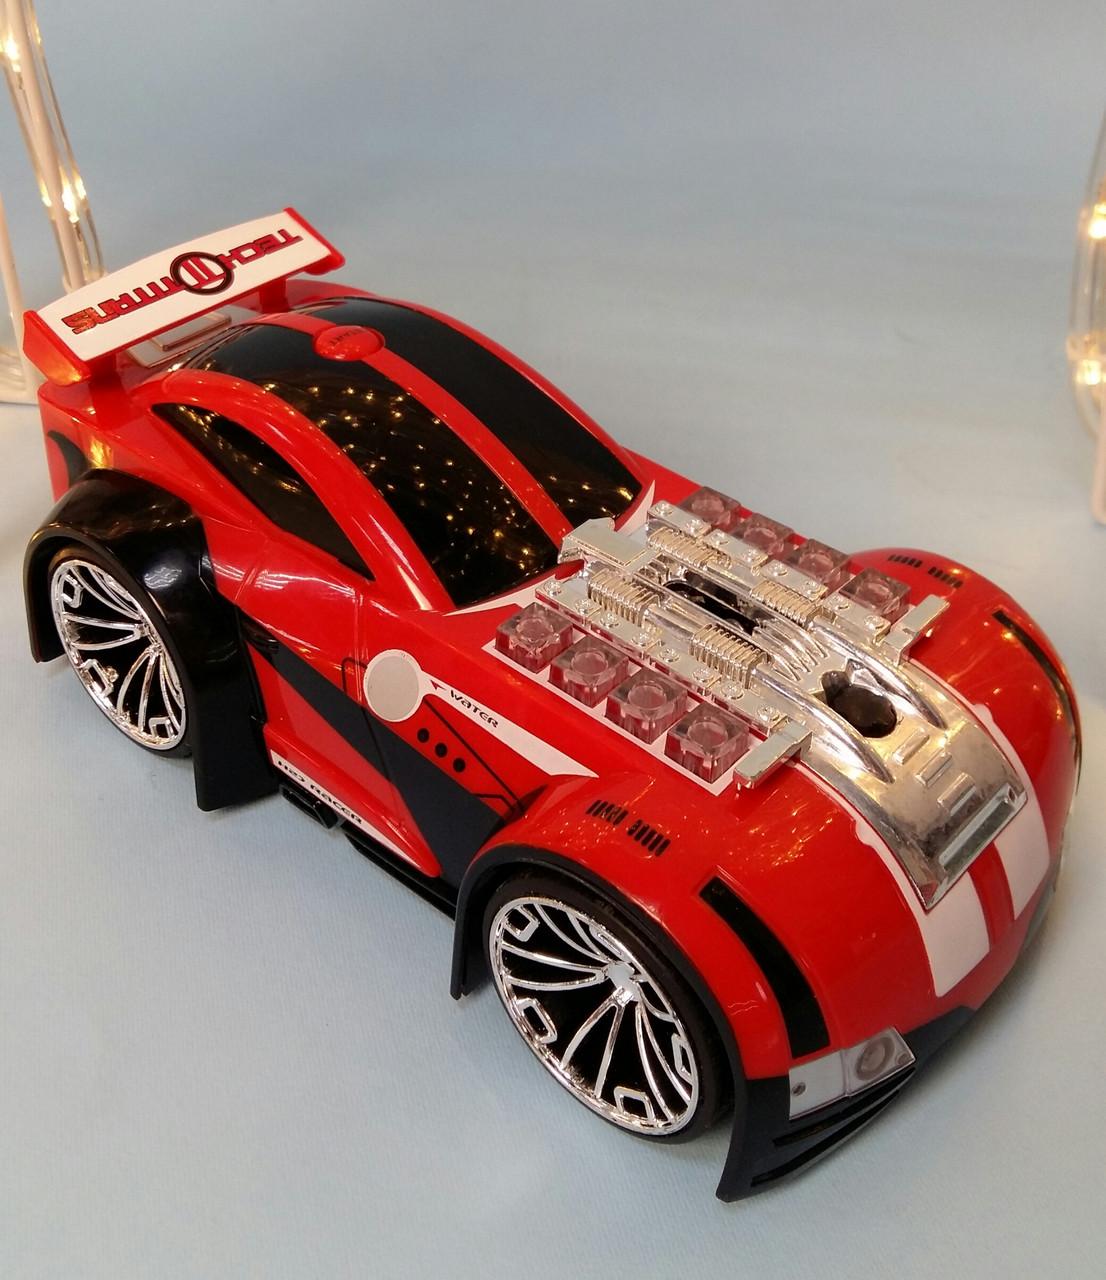 Машина H2O Racer, Машинка спортивна 24510